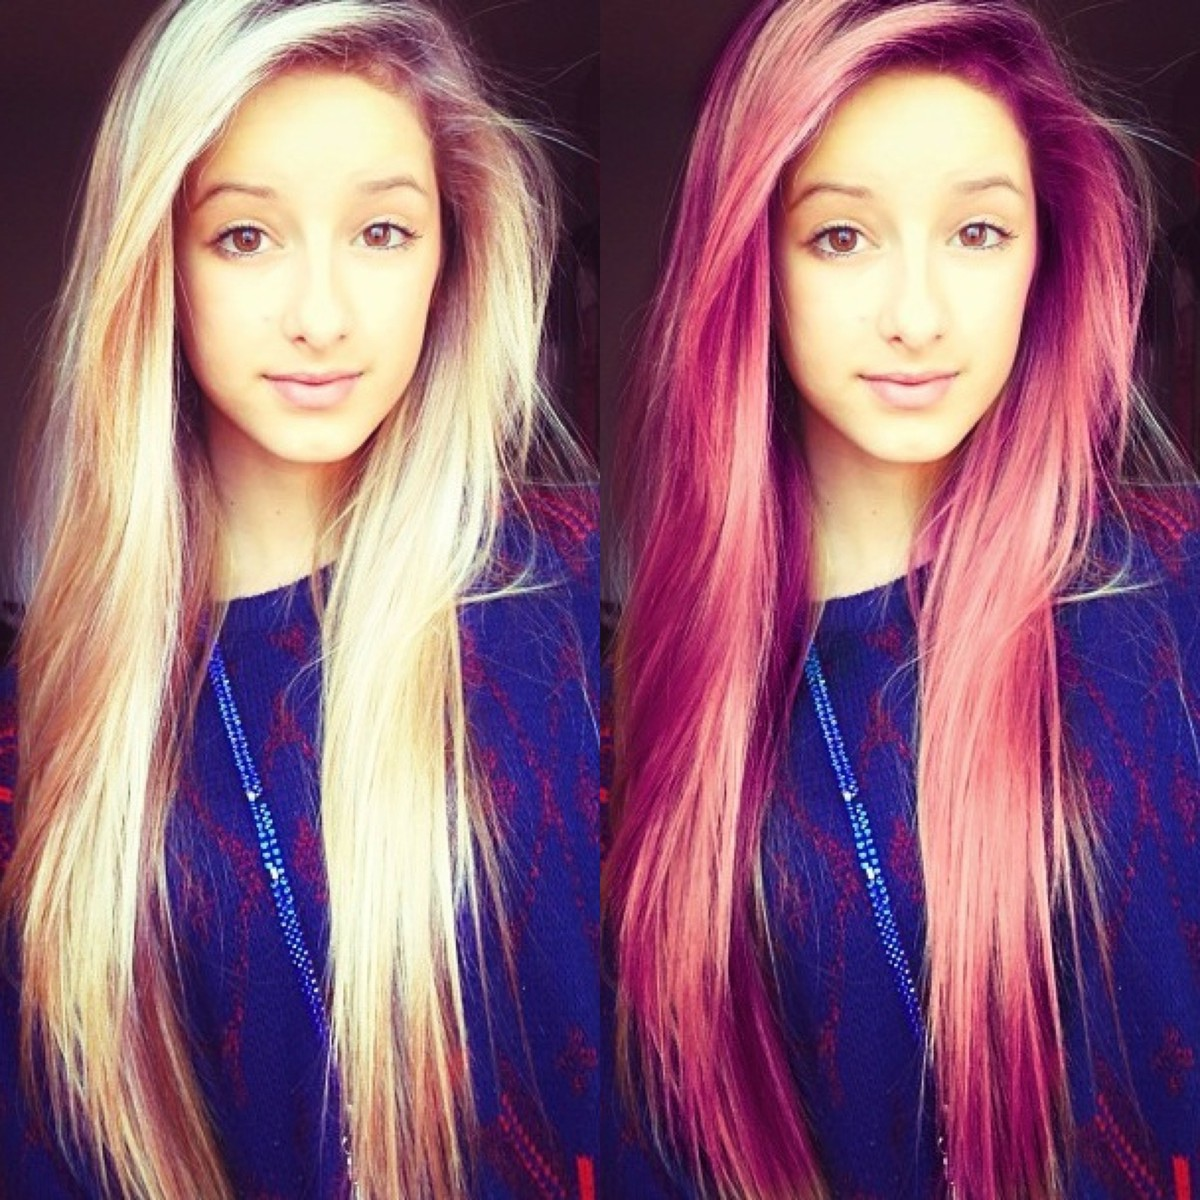 Should I Dye My Hair?